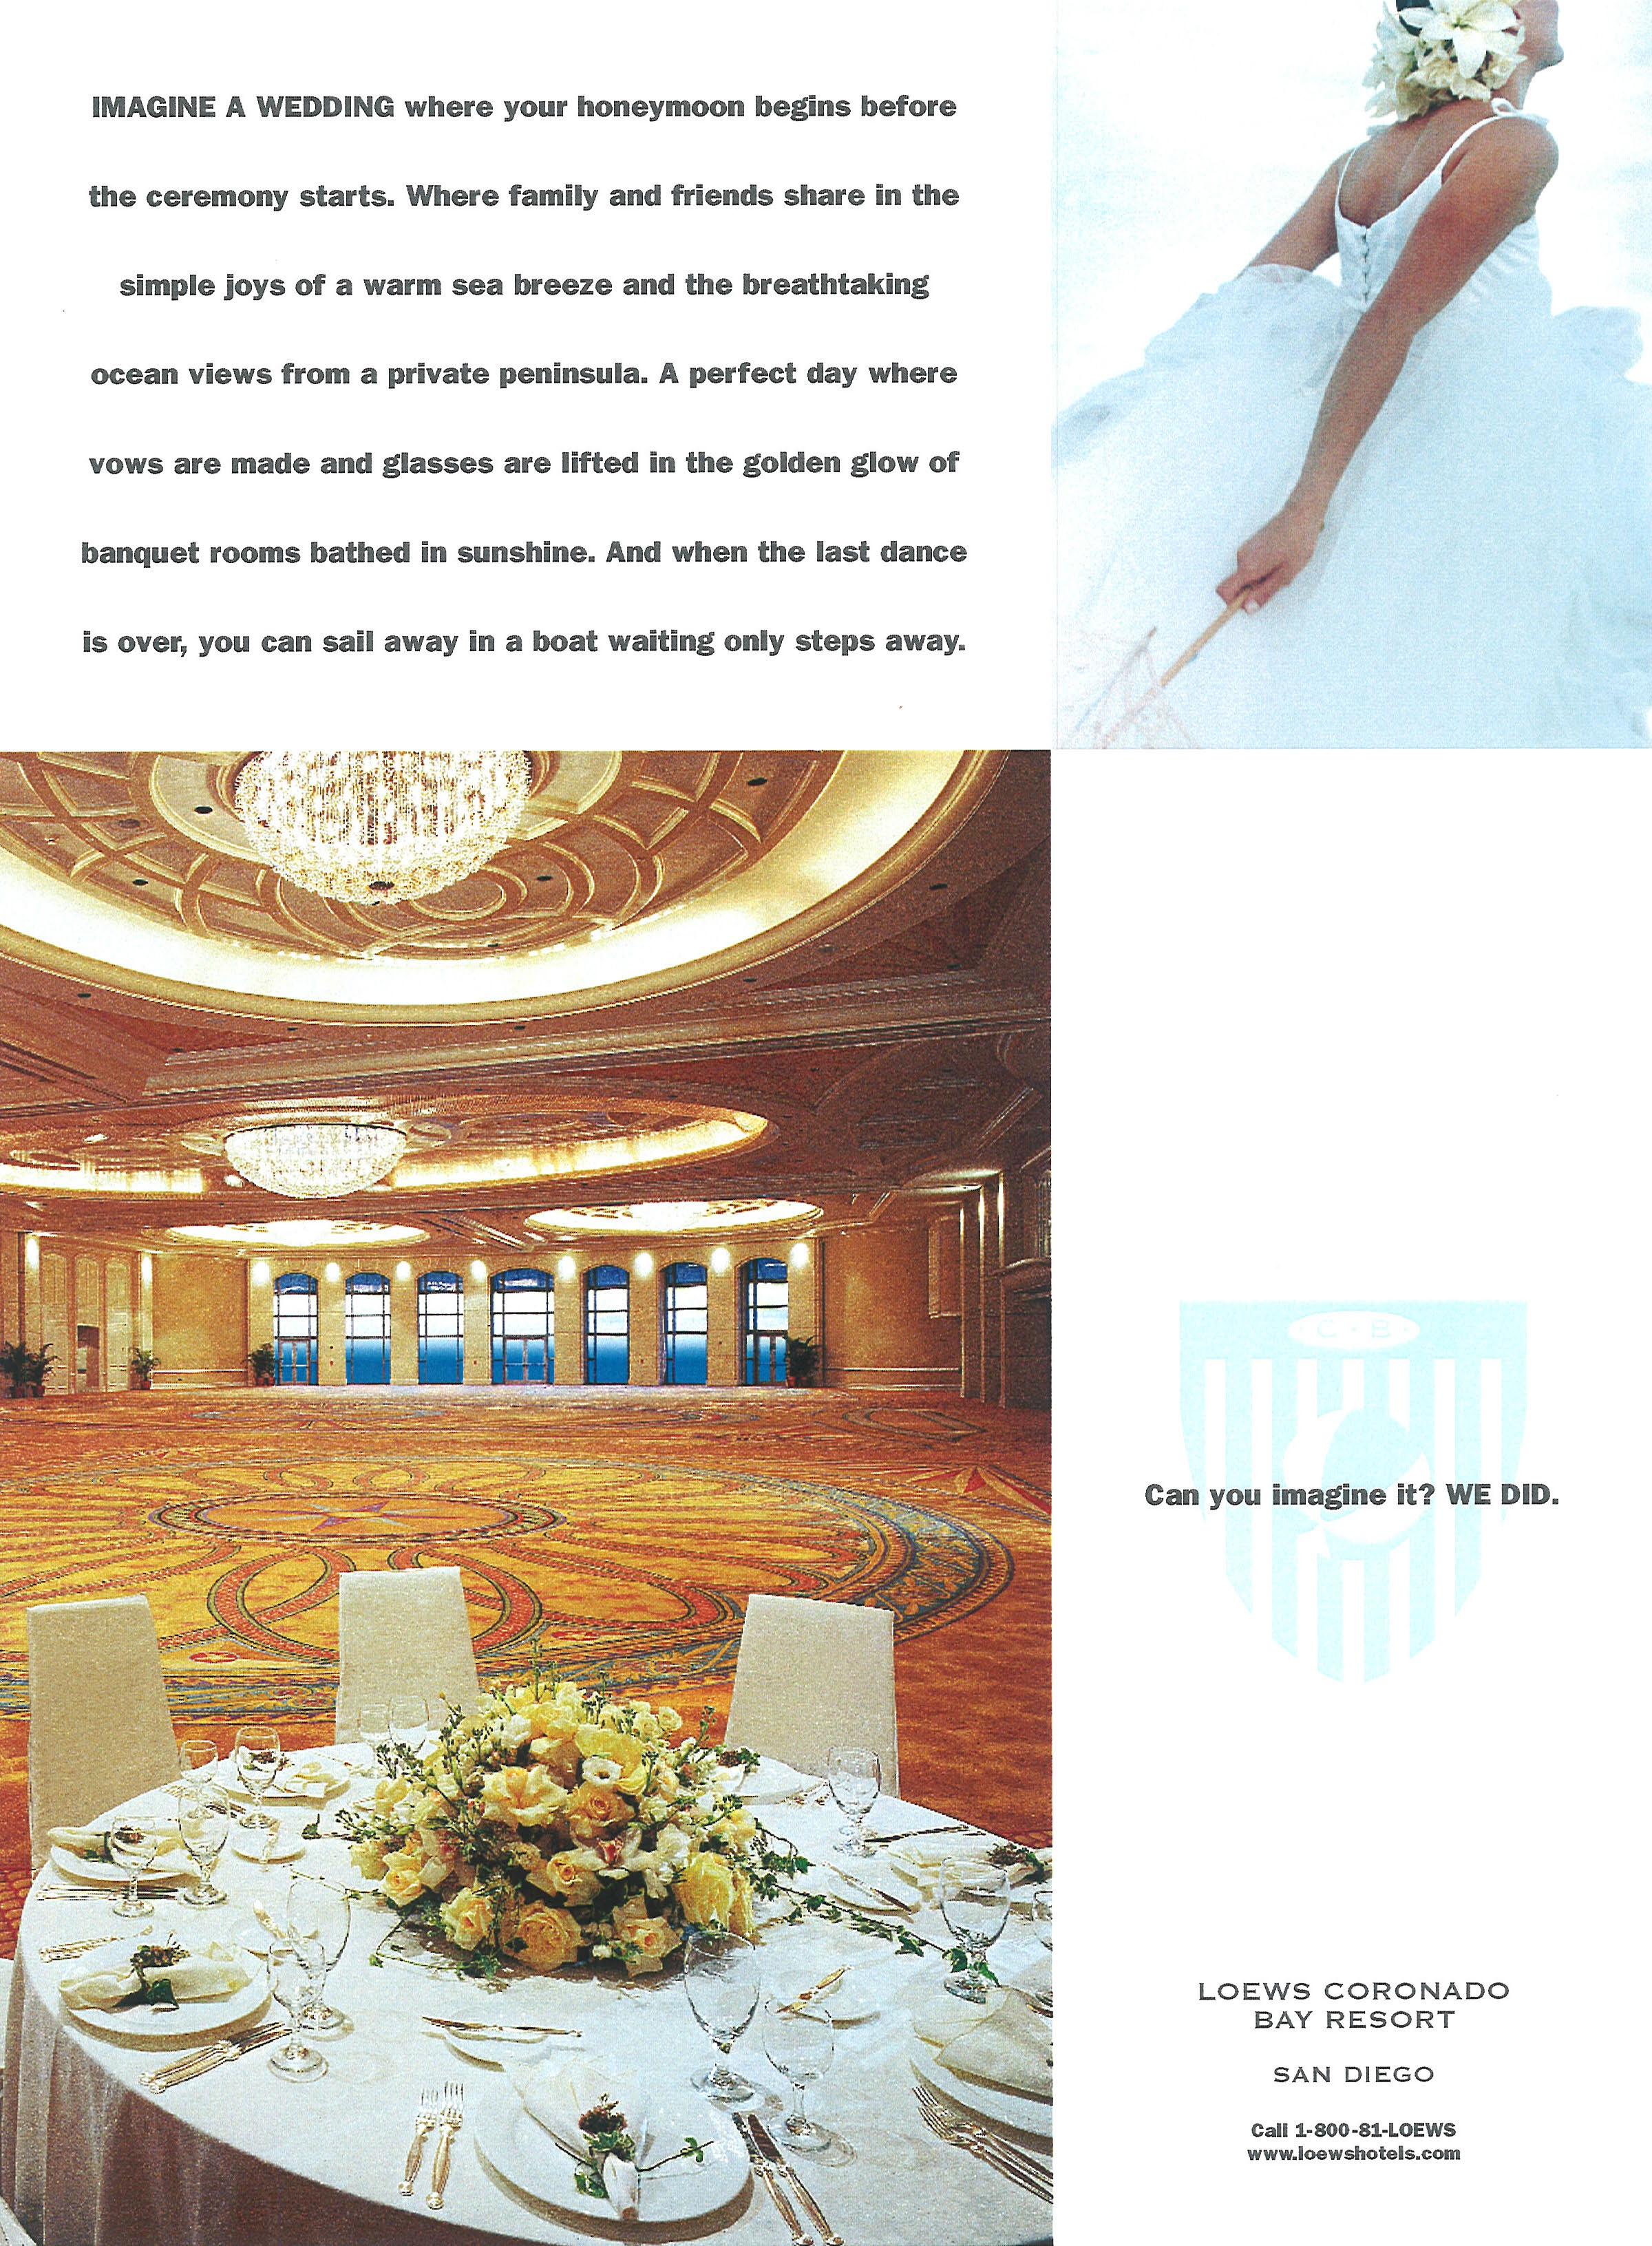 Loews Hotels print ad 1.jpg